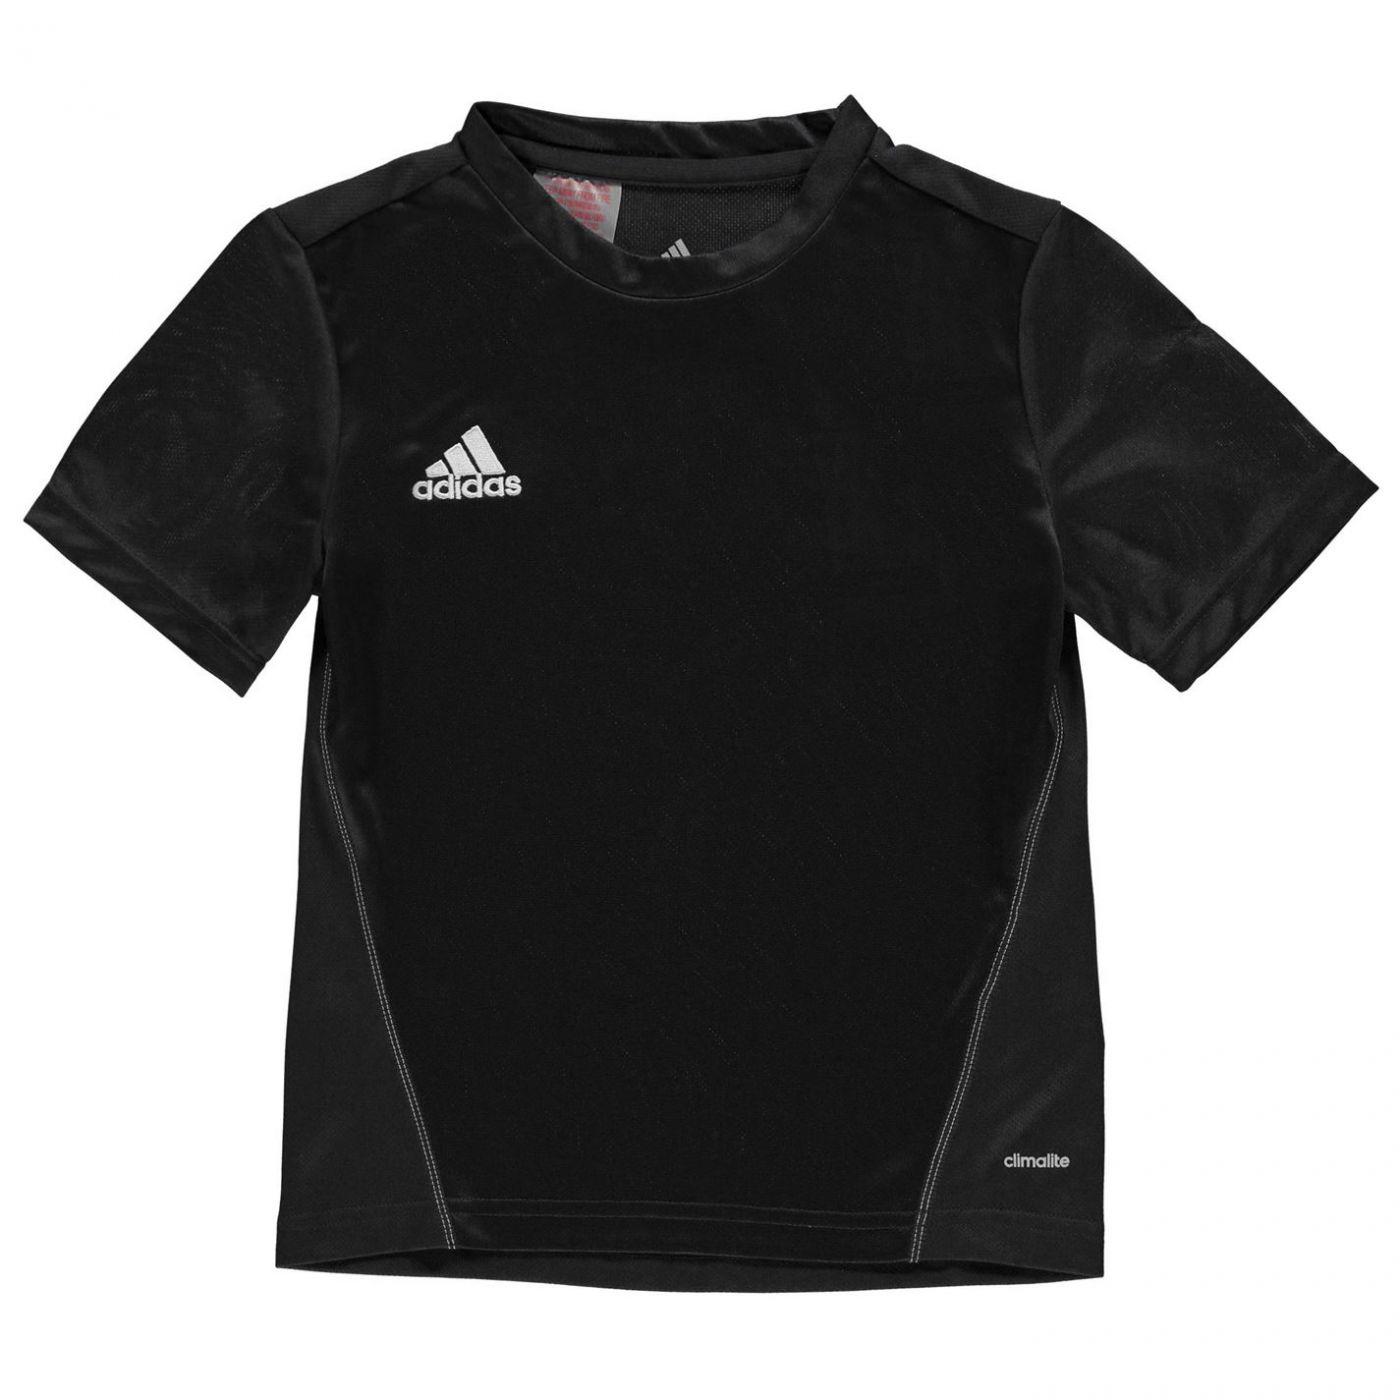 Adidas Coref Jersey Junior Boys